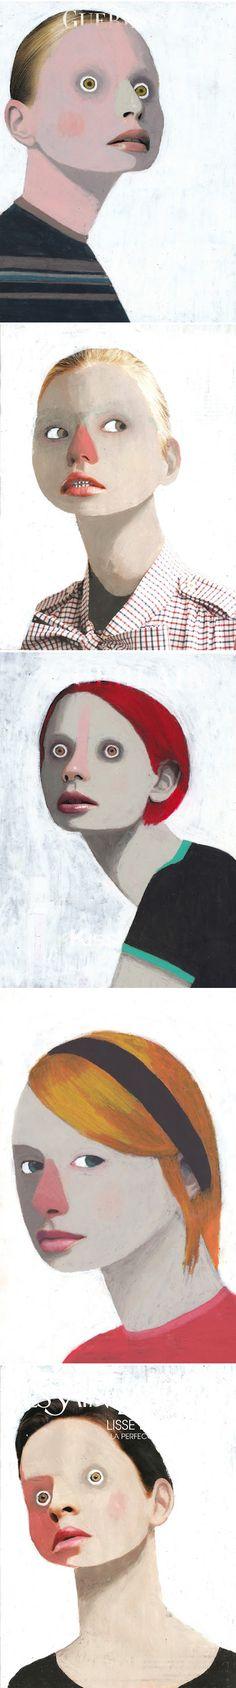 by guim tio zarraluki. creepy cool.